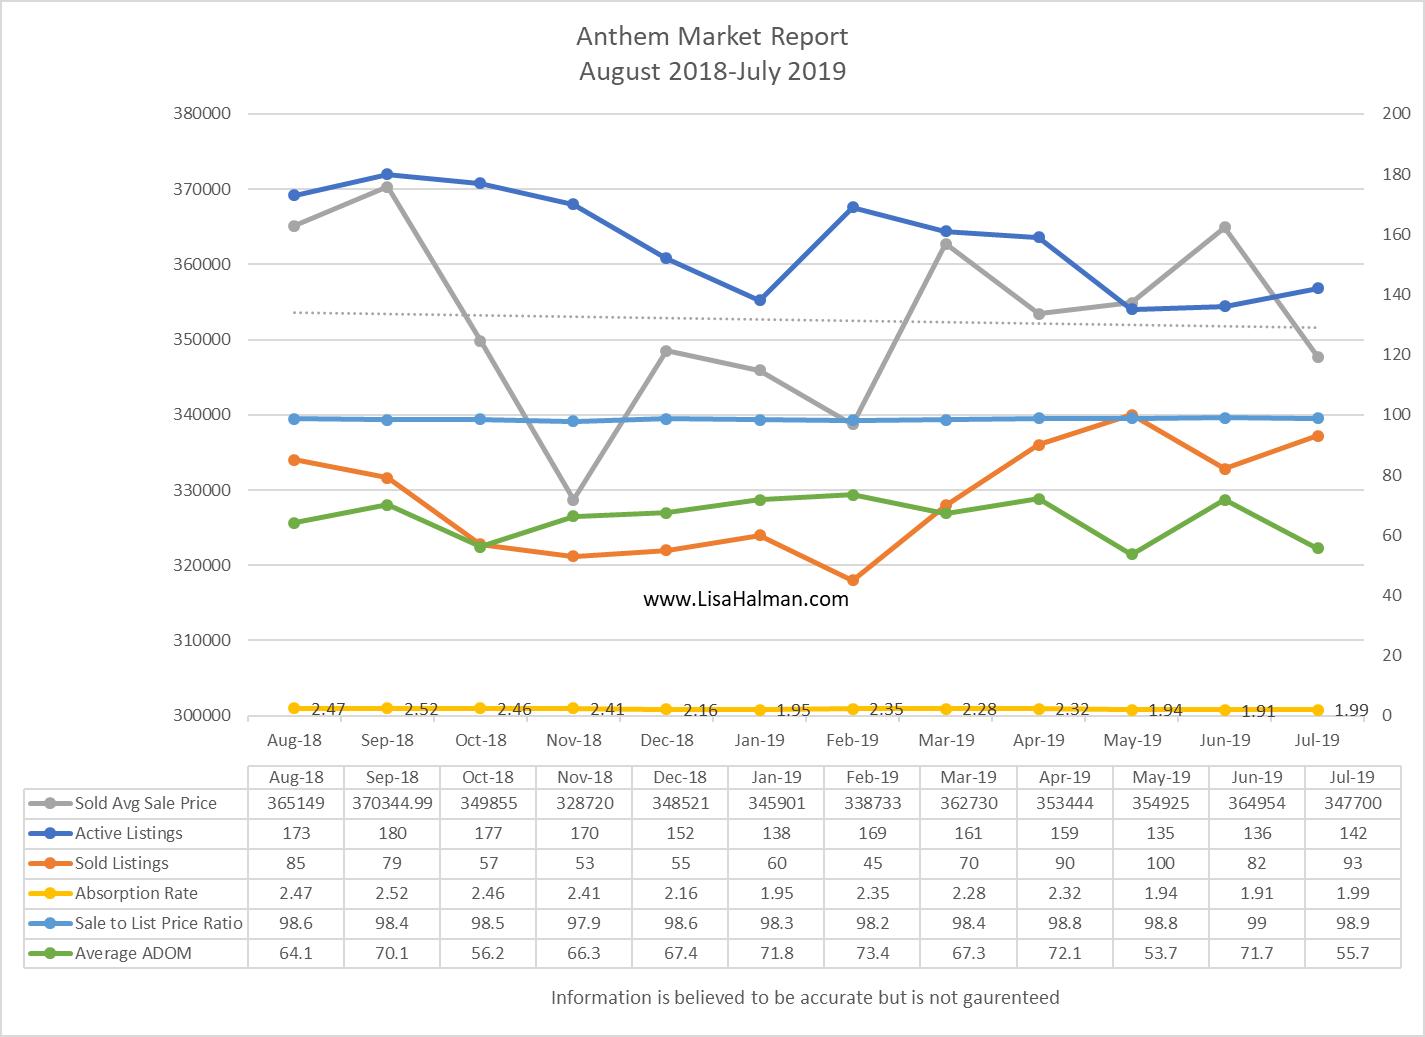 Anthem Market Report July 2019